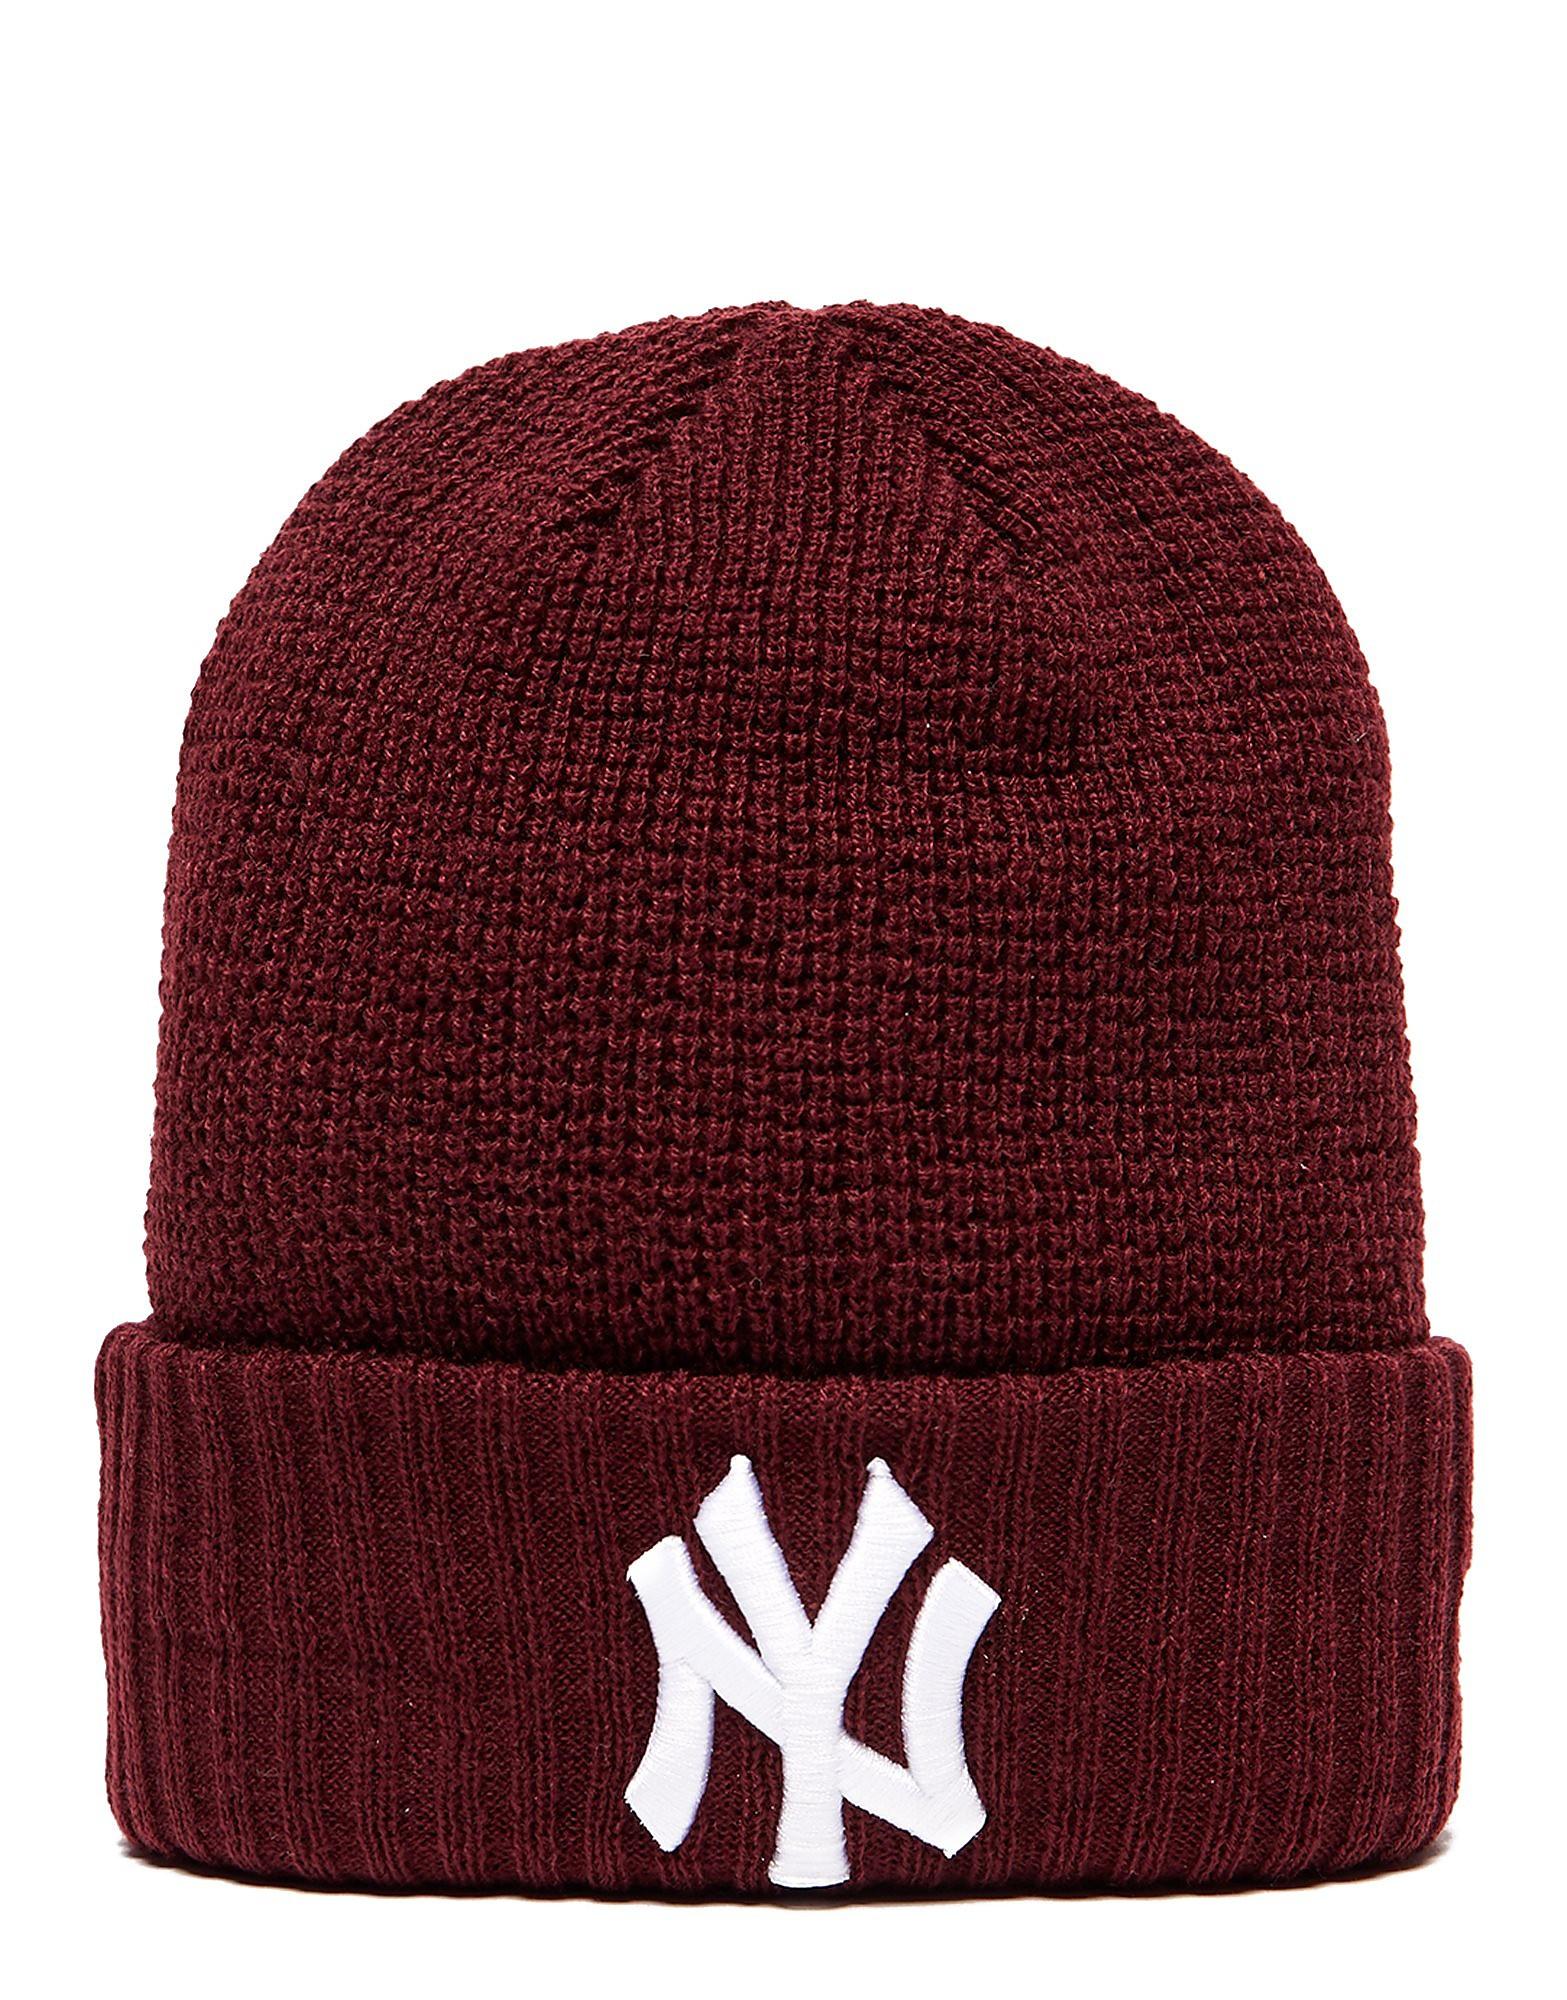 New Era MLB New York Yankees Knit Beanie